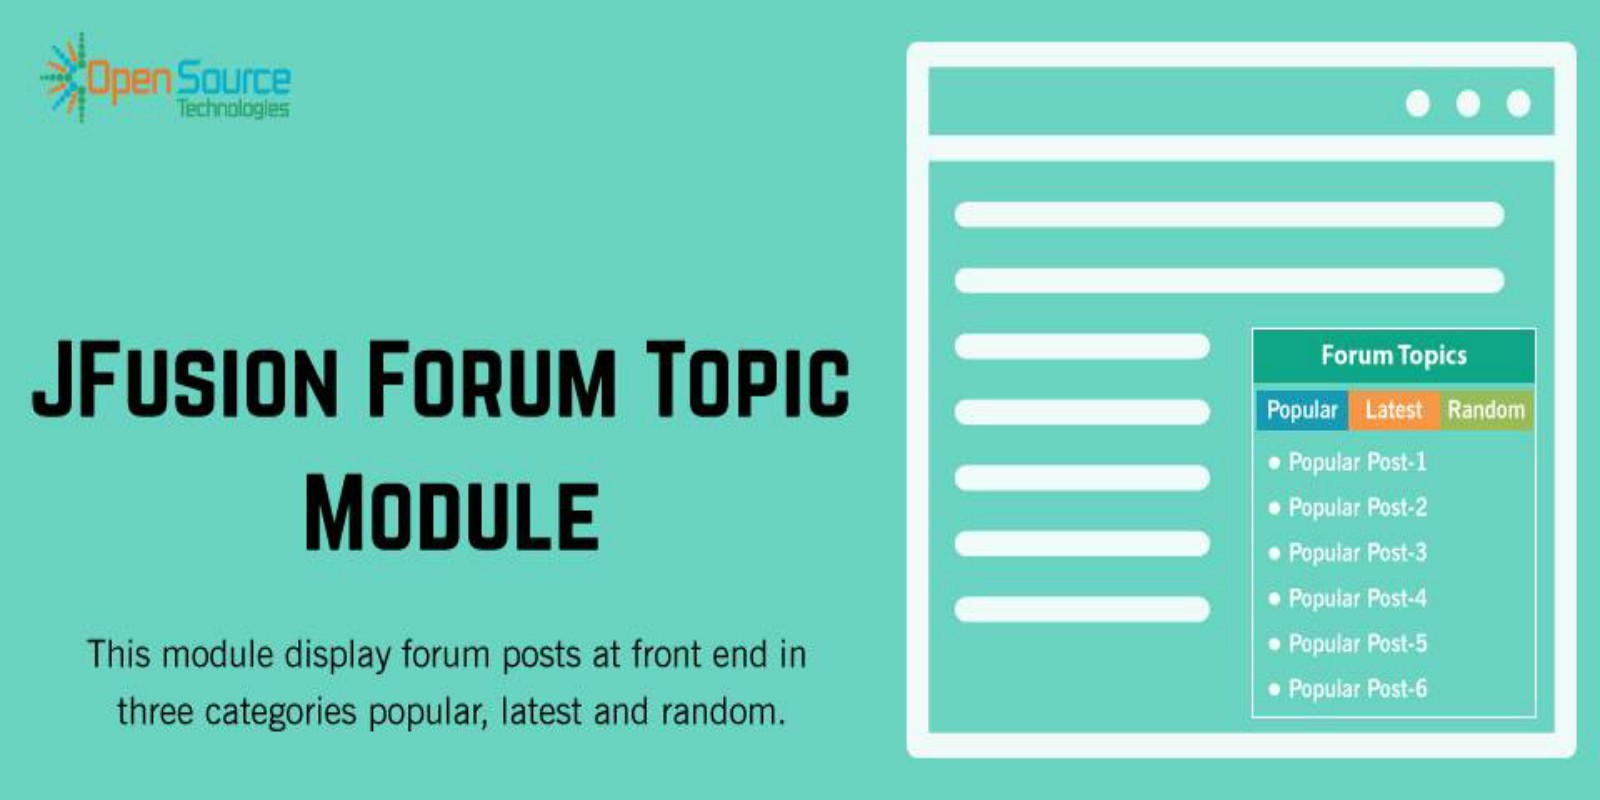 Jfusion Forum Topic Module